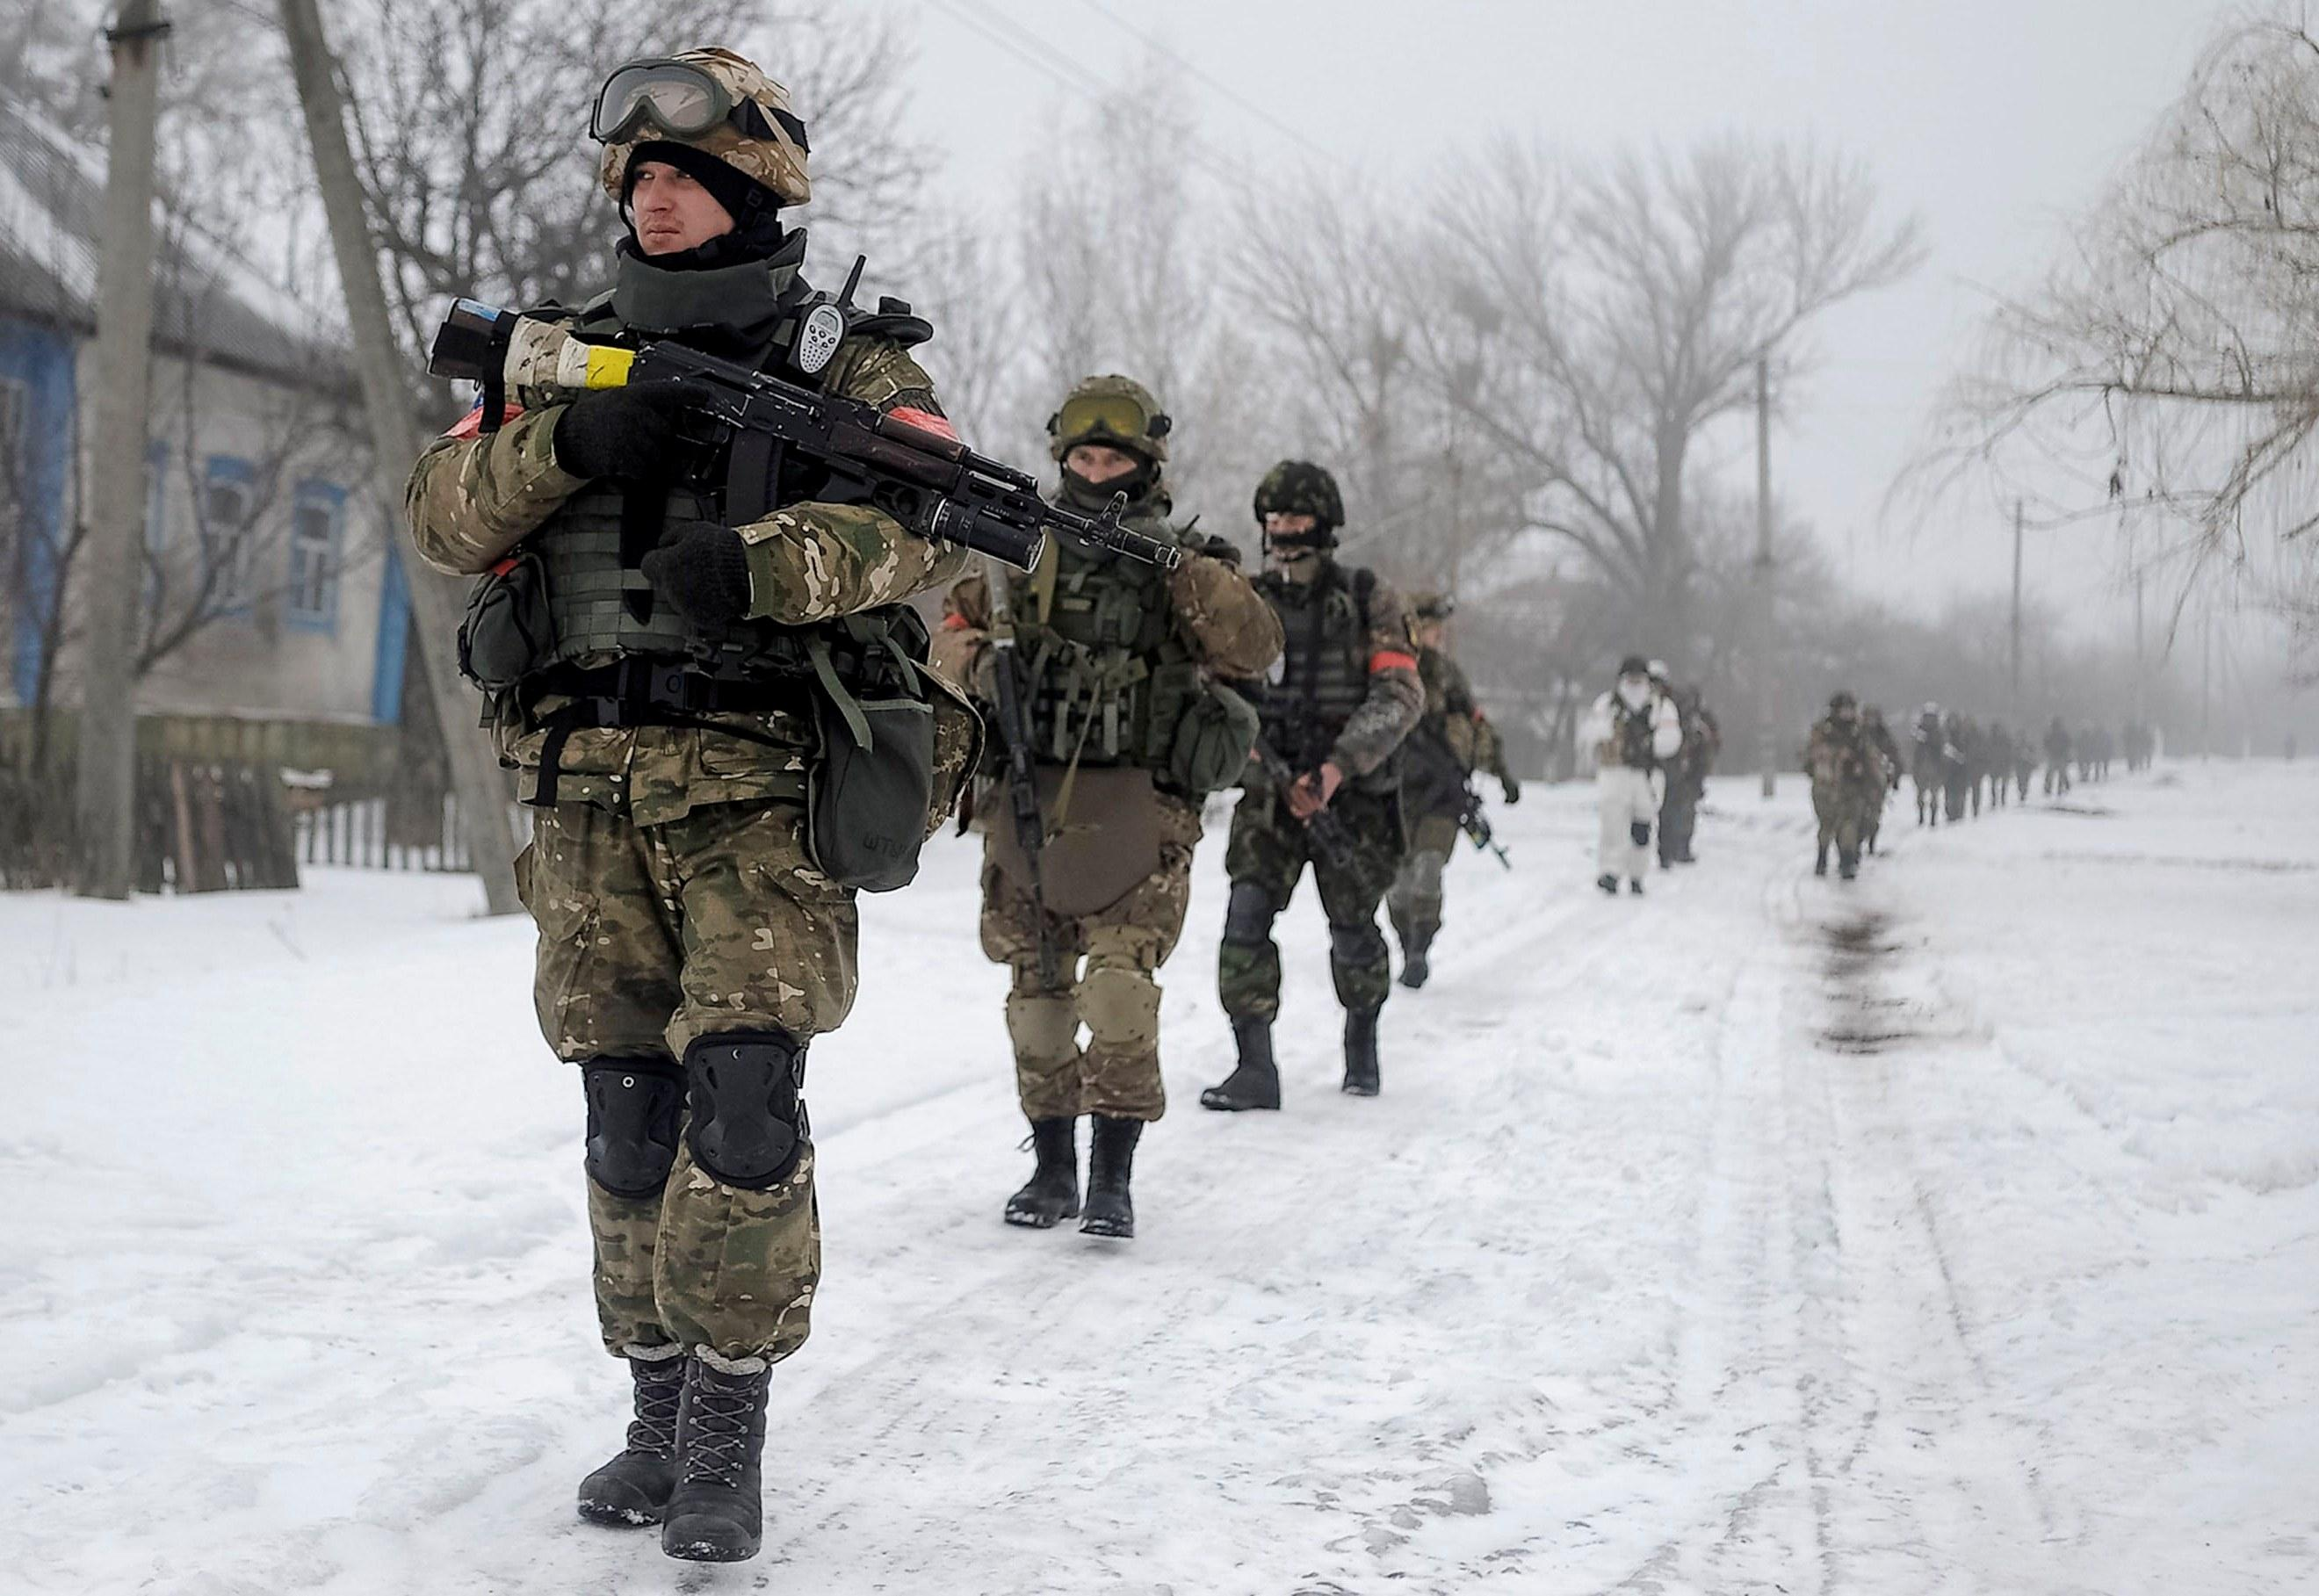 ДНР: Украинские силовики нарушили перемирие один раз засутки